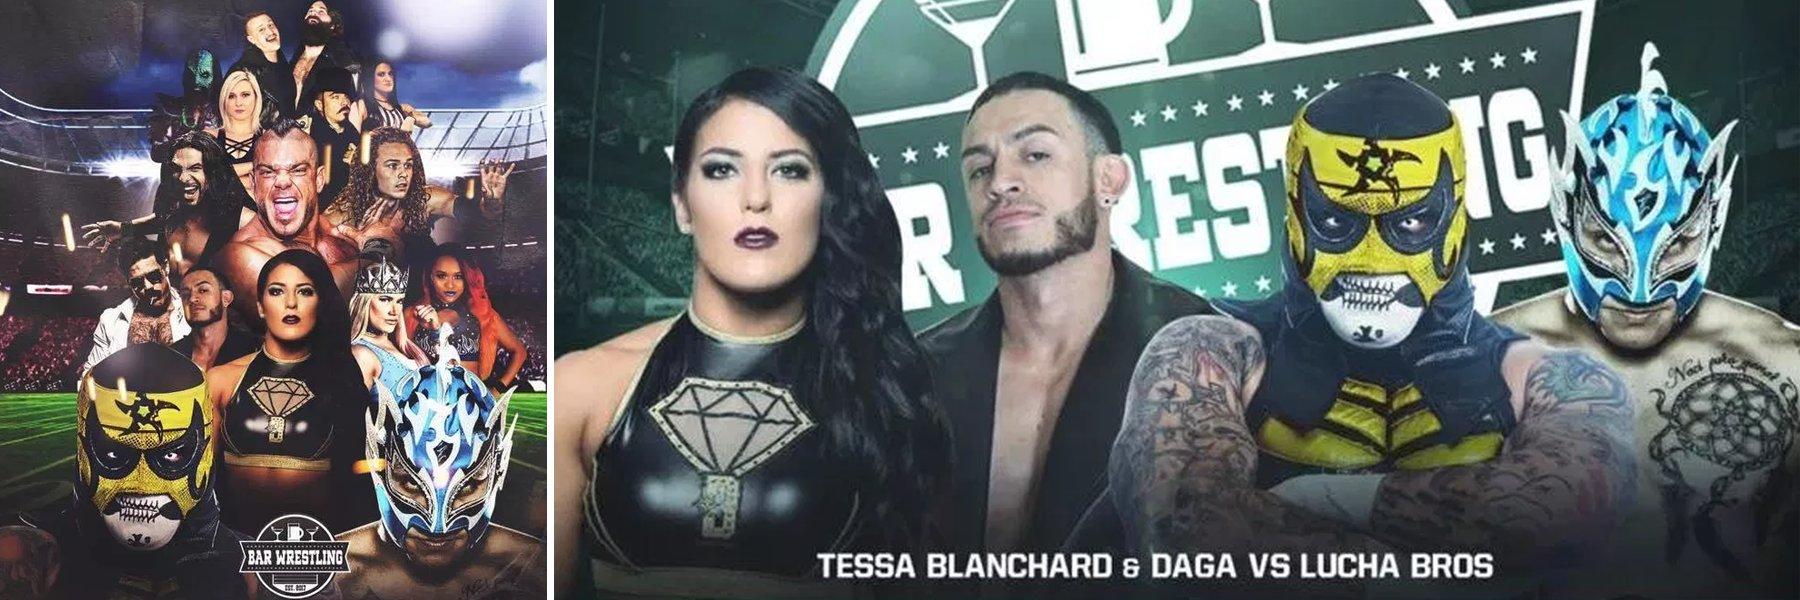 New Bar Wrestling! See Tessa Blanchard, Lucha Bros, Joey Ryan, Brian Cage